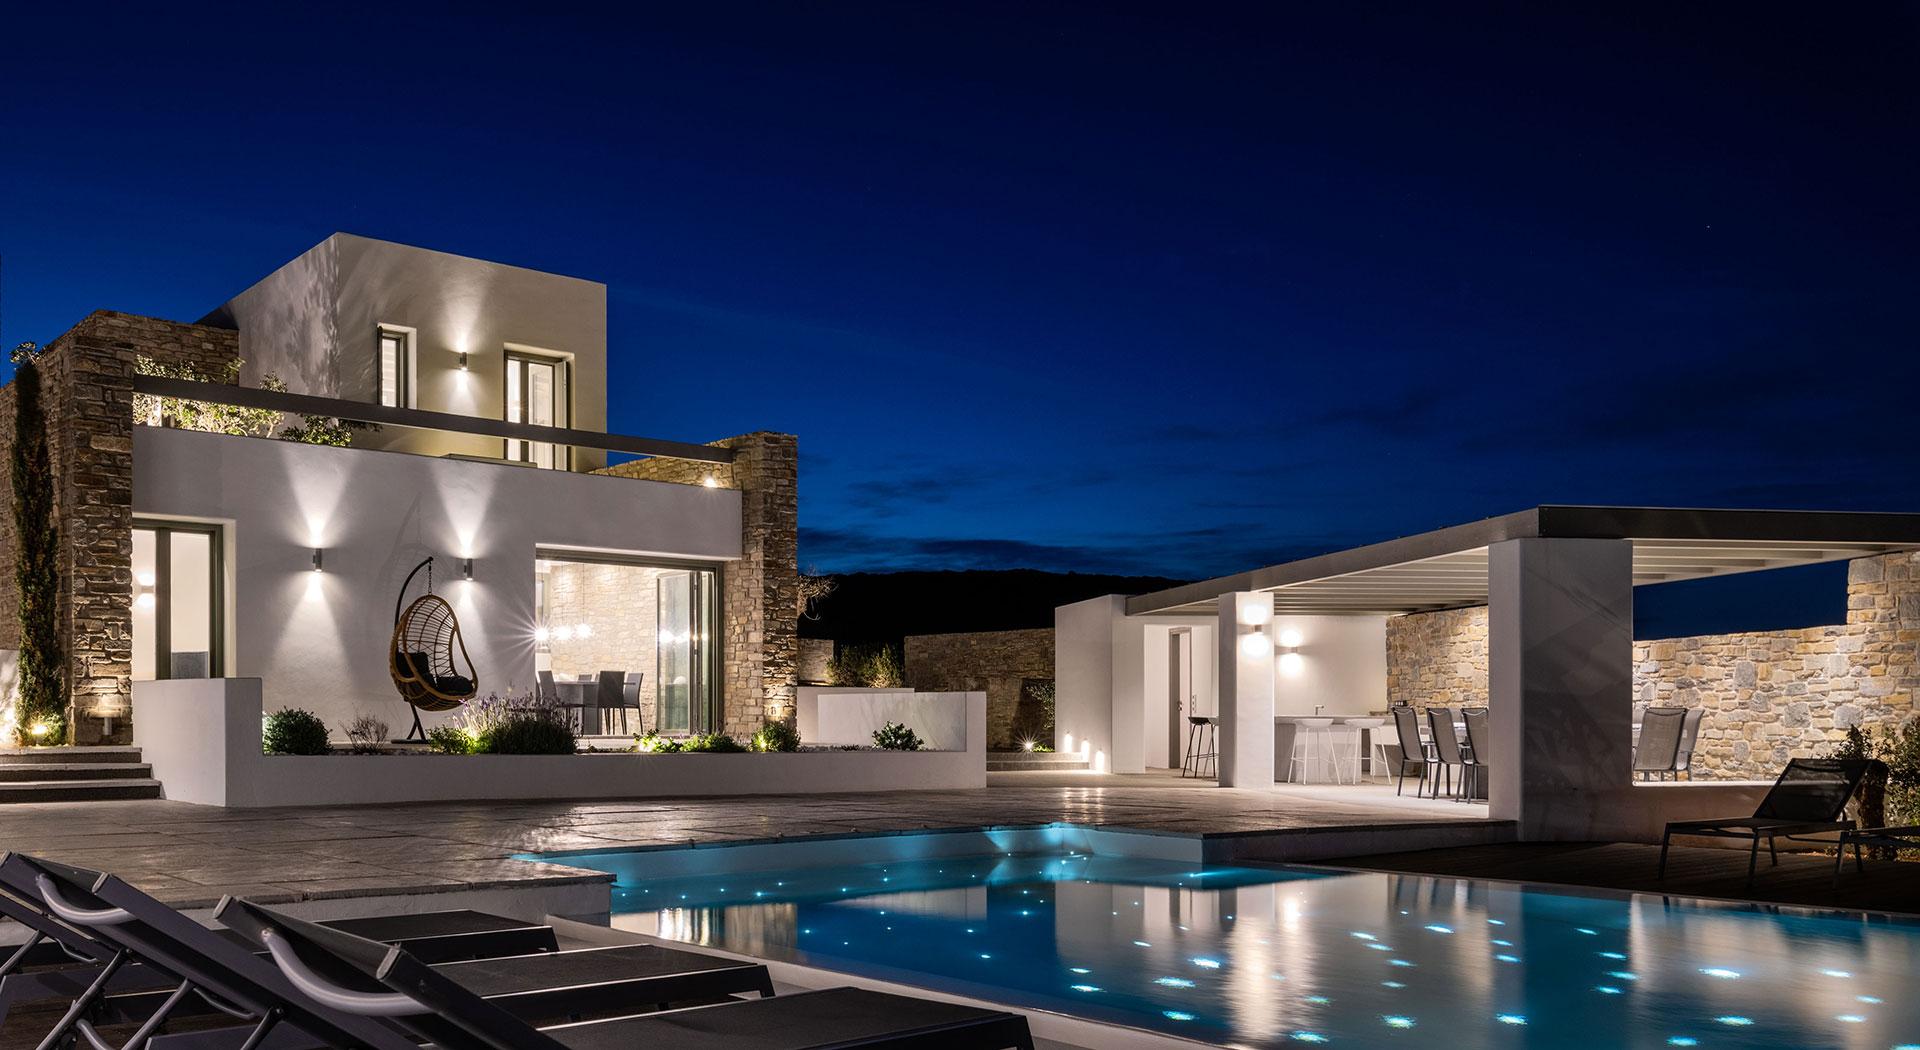 Villas in Santa Maria - Yliessa 8